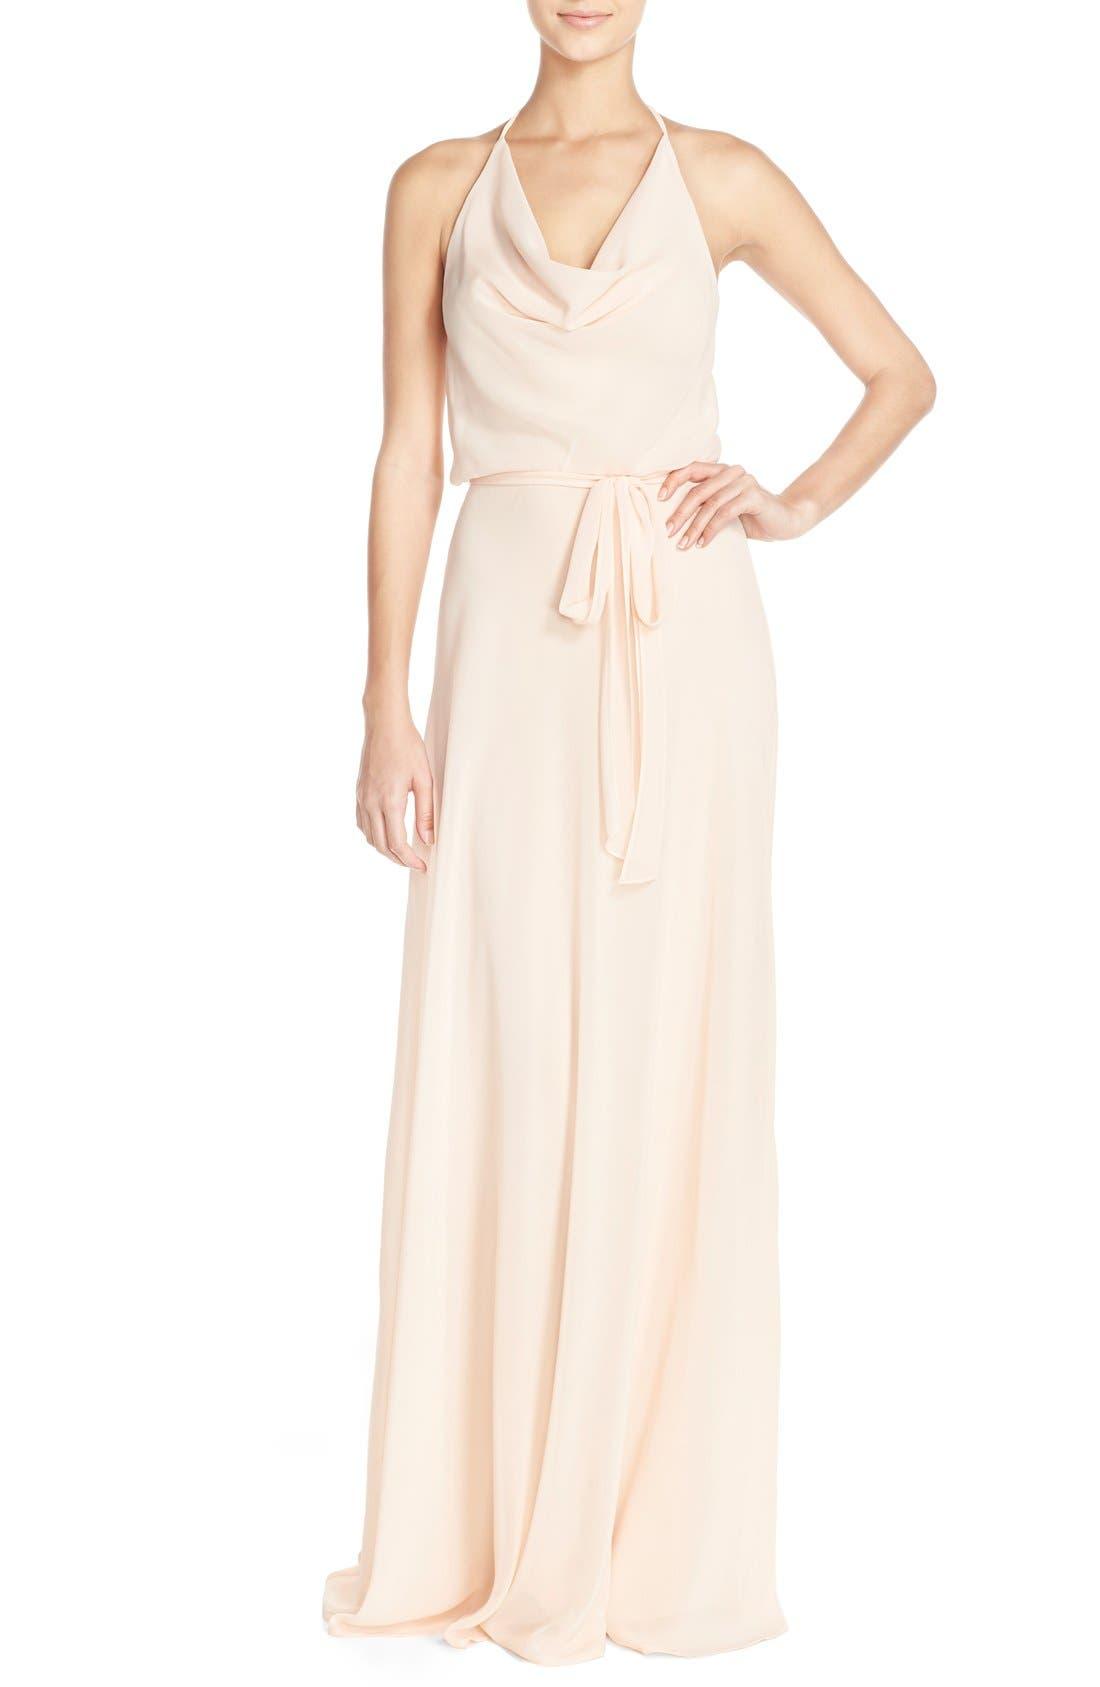 'Alyssa' Cowl Neck Chiffon Halter Gown,                         Main,                         color, 271